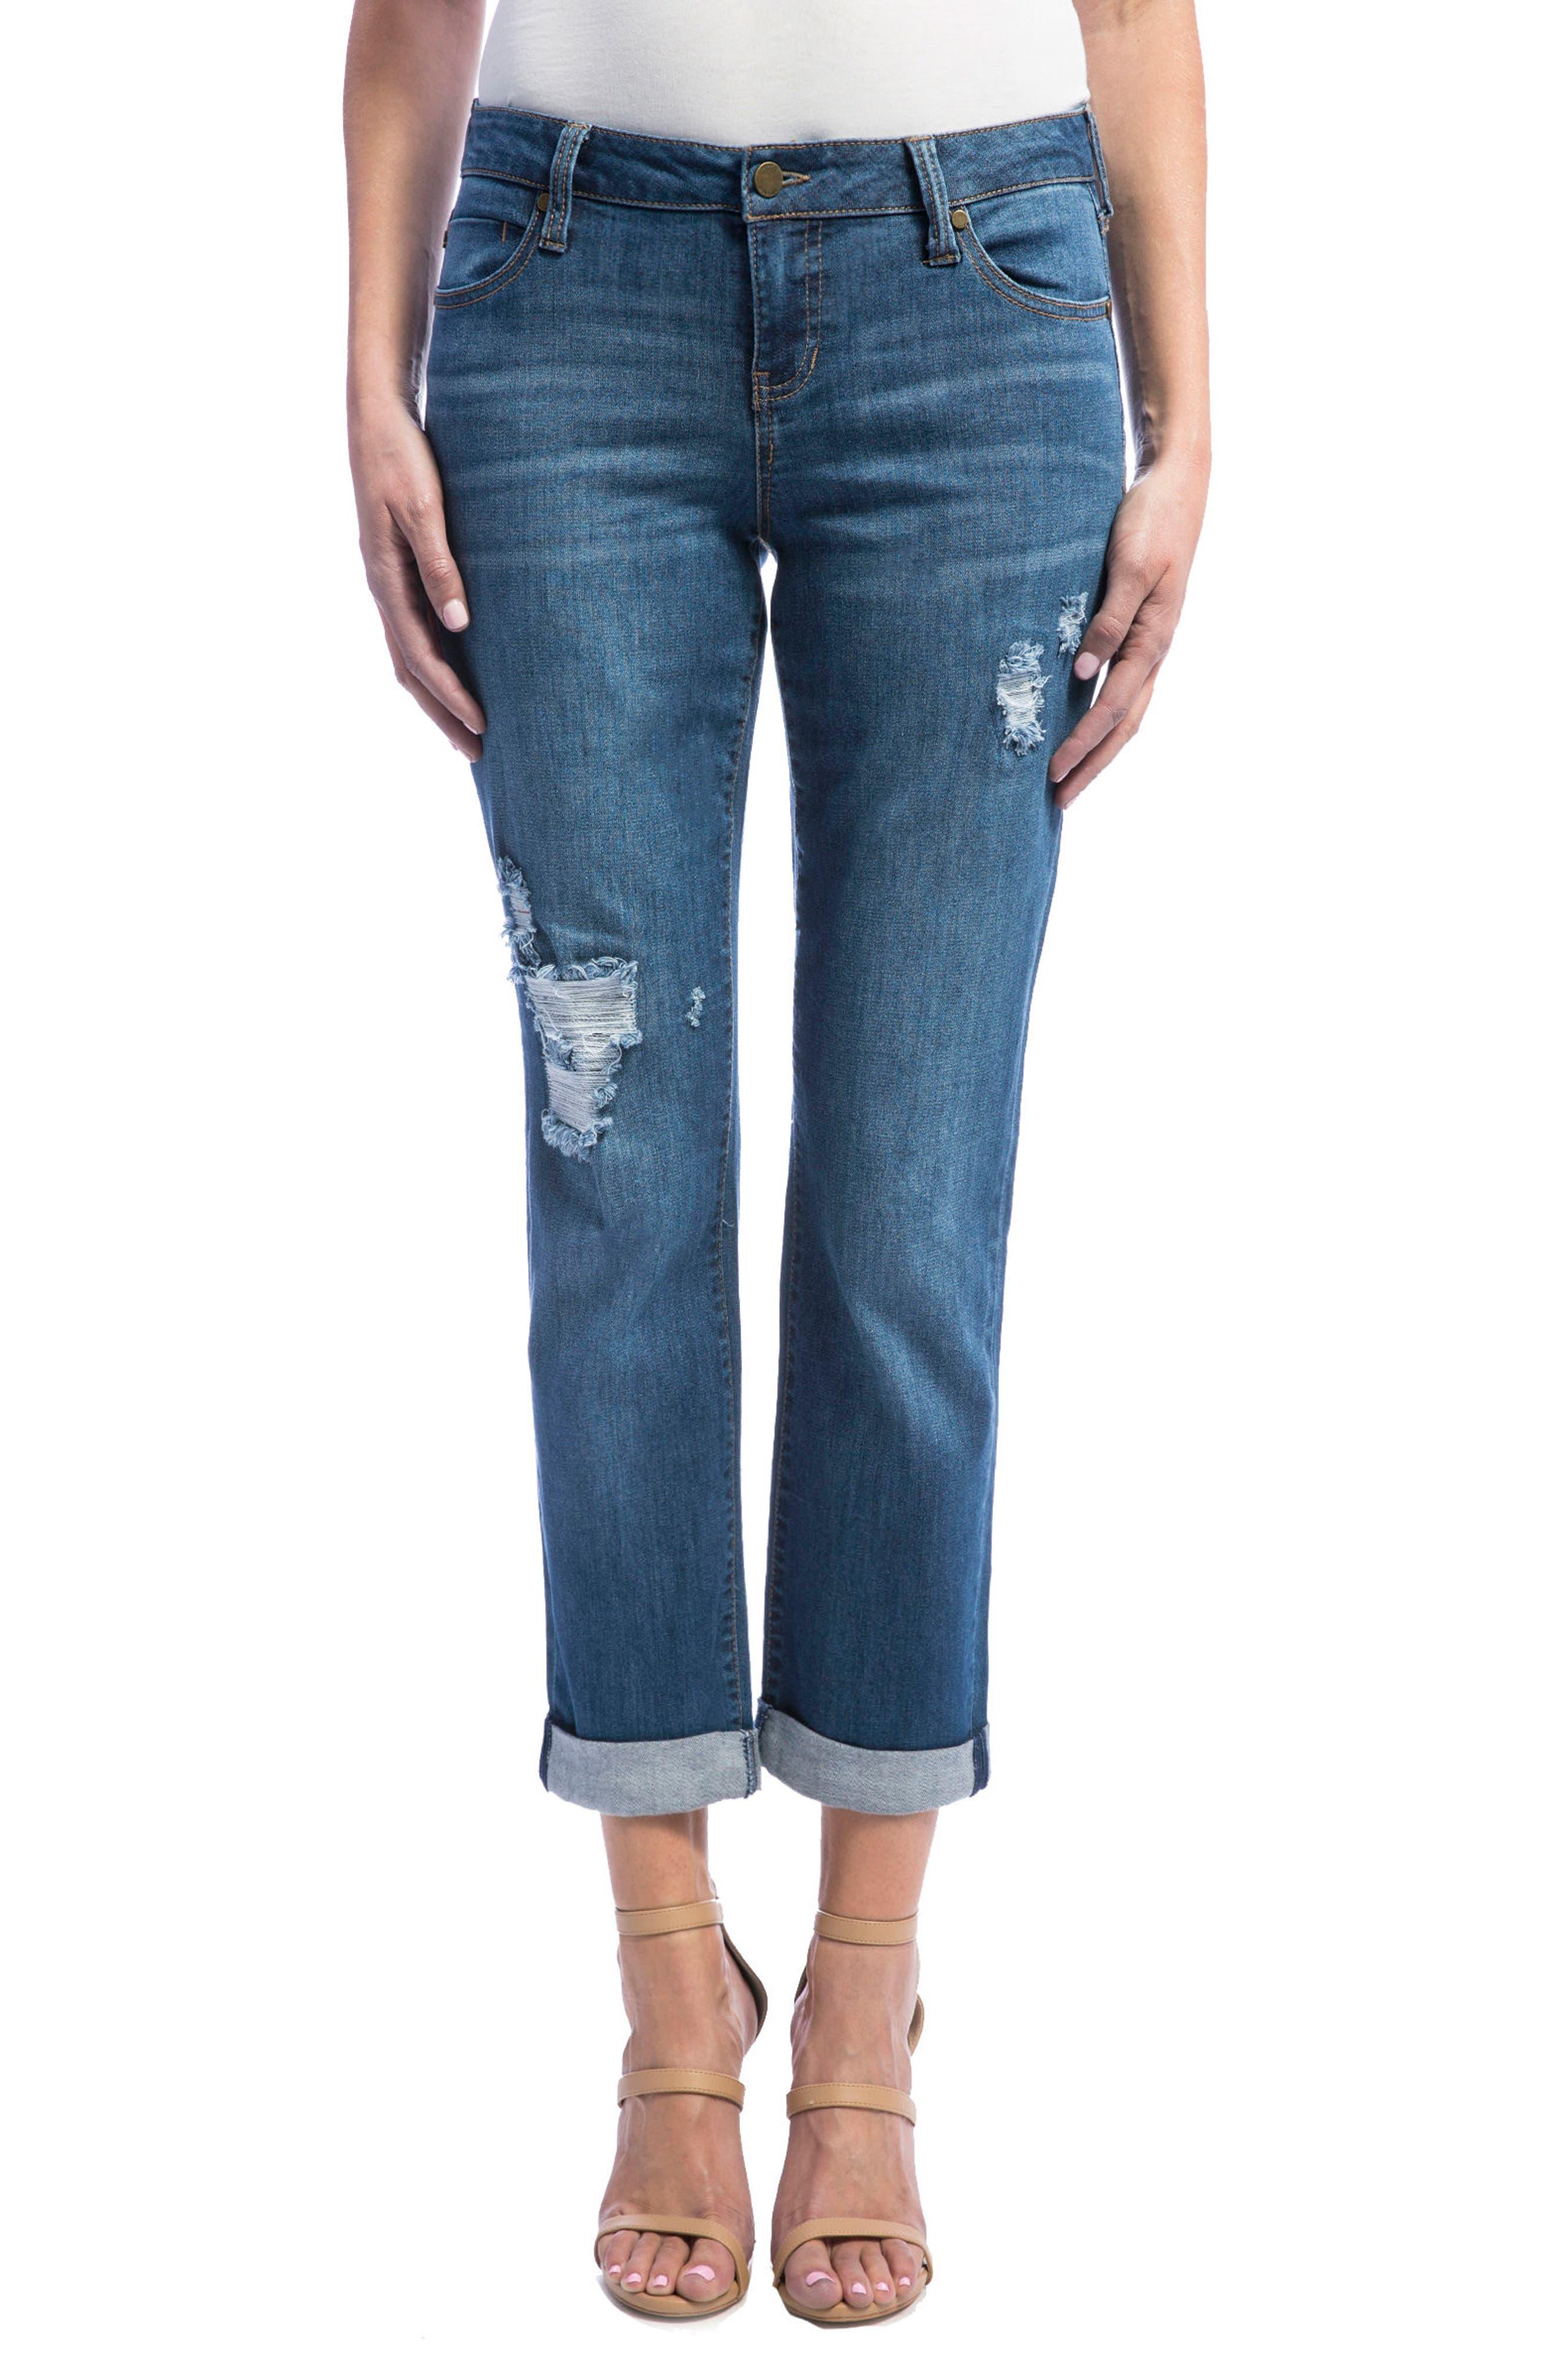 Jeans Company Peyton Slim Stretch Crop Boyfriend Jeans,                         Main,                         color, 401